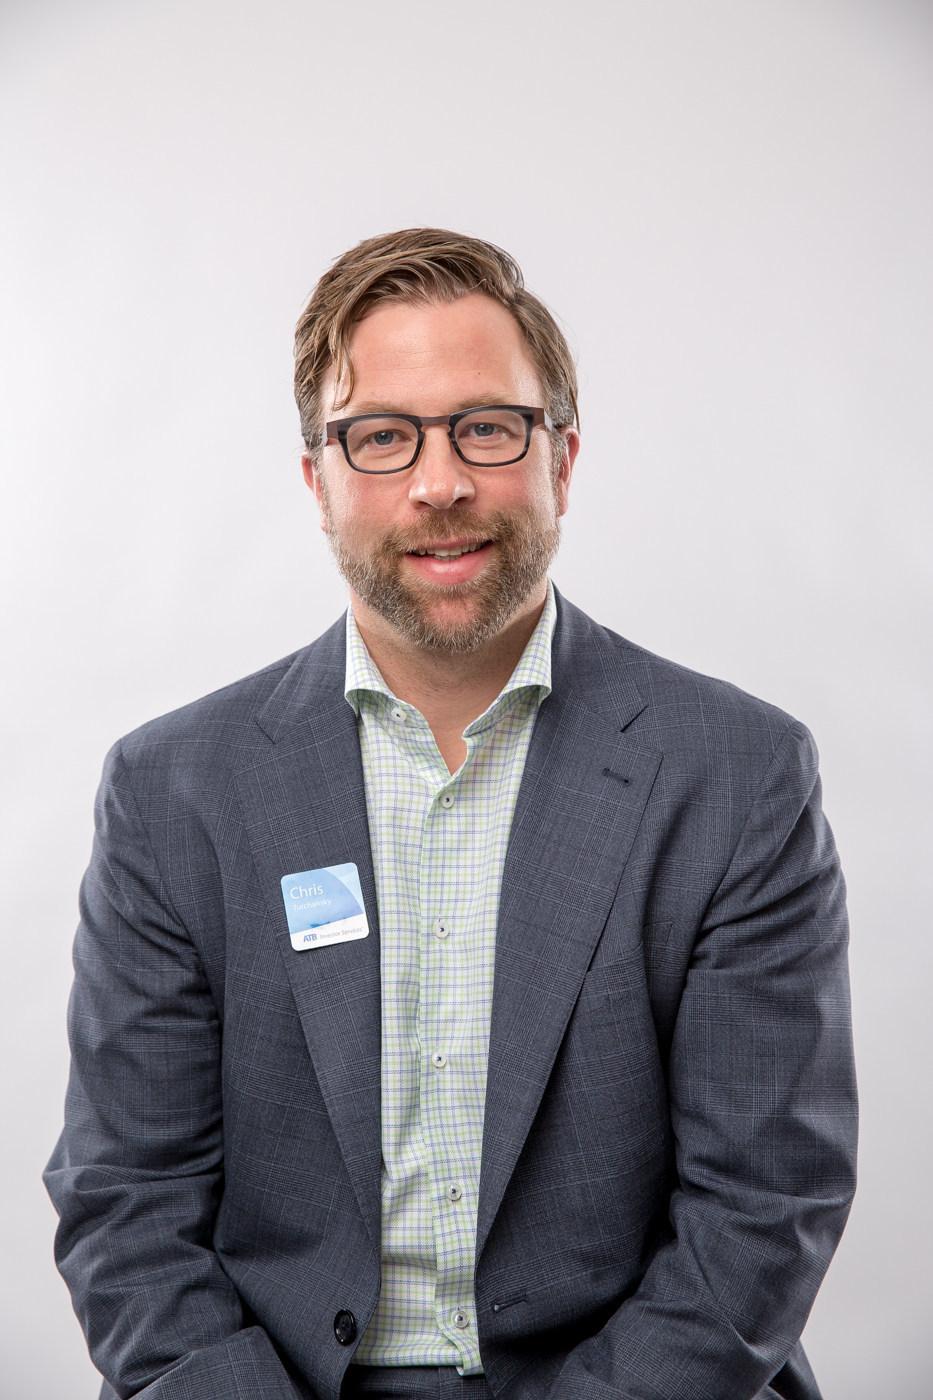 Chris Turchansky, President, ATB Wealth (CNW Group/ATB Financial)